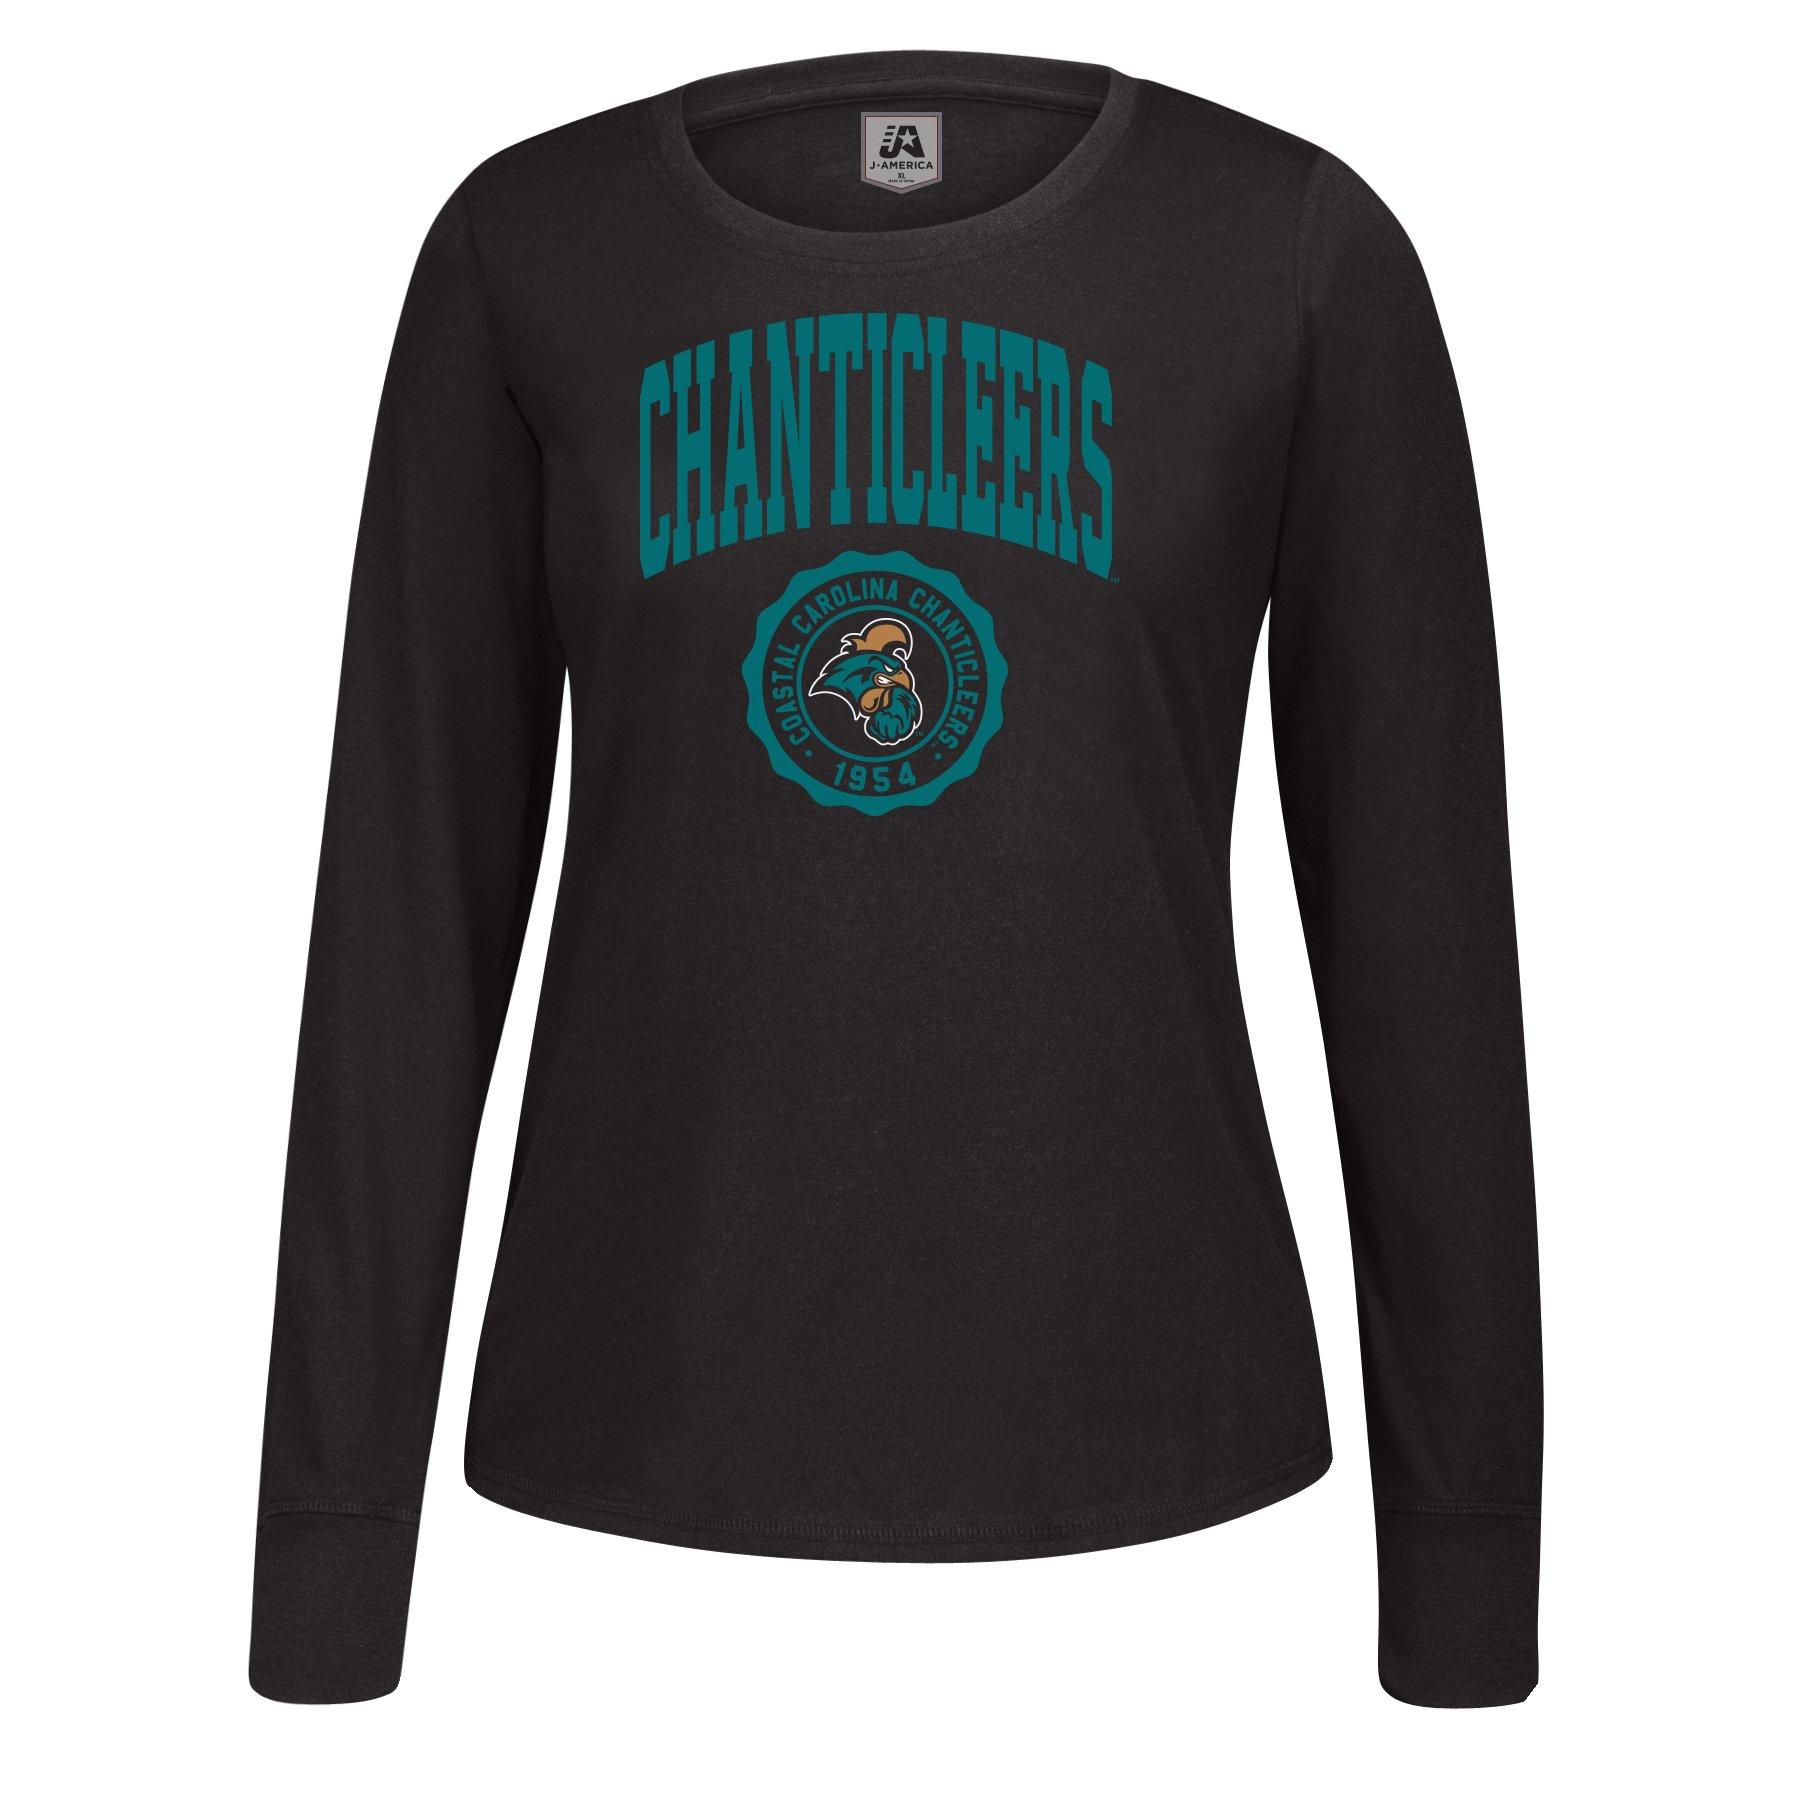 J America NCAA Coastal Carolina Chanticleers Women's Athletic Seal Long Sleeve Essential Tee, Small, Black